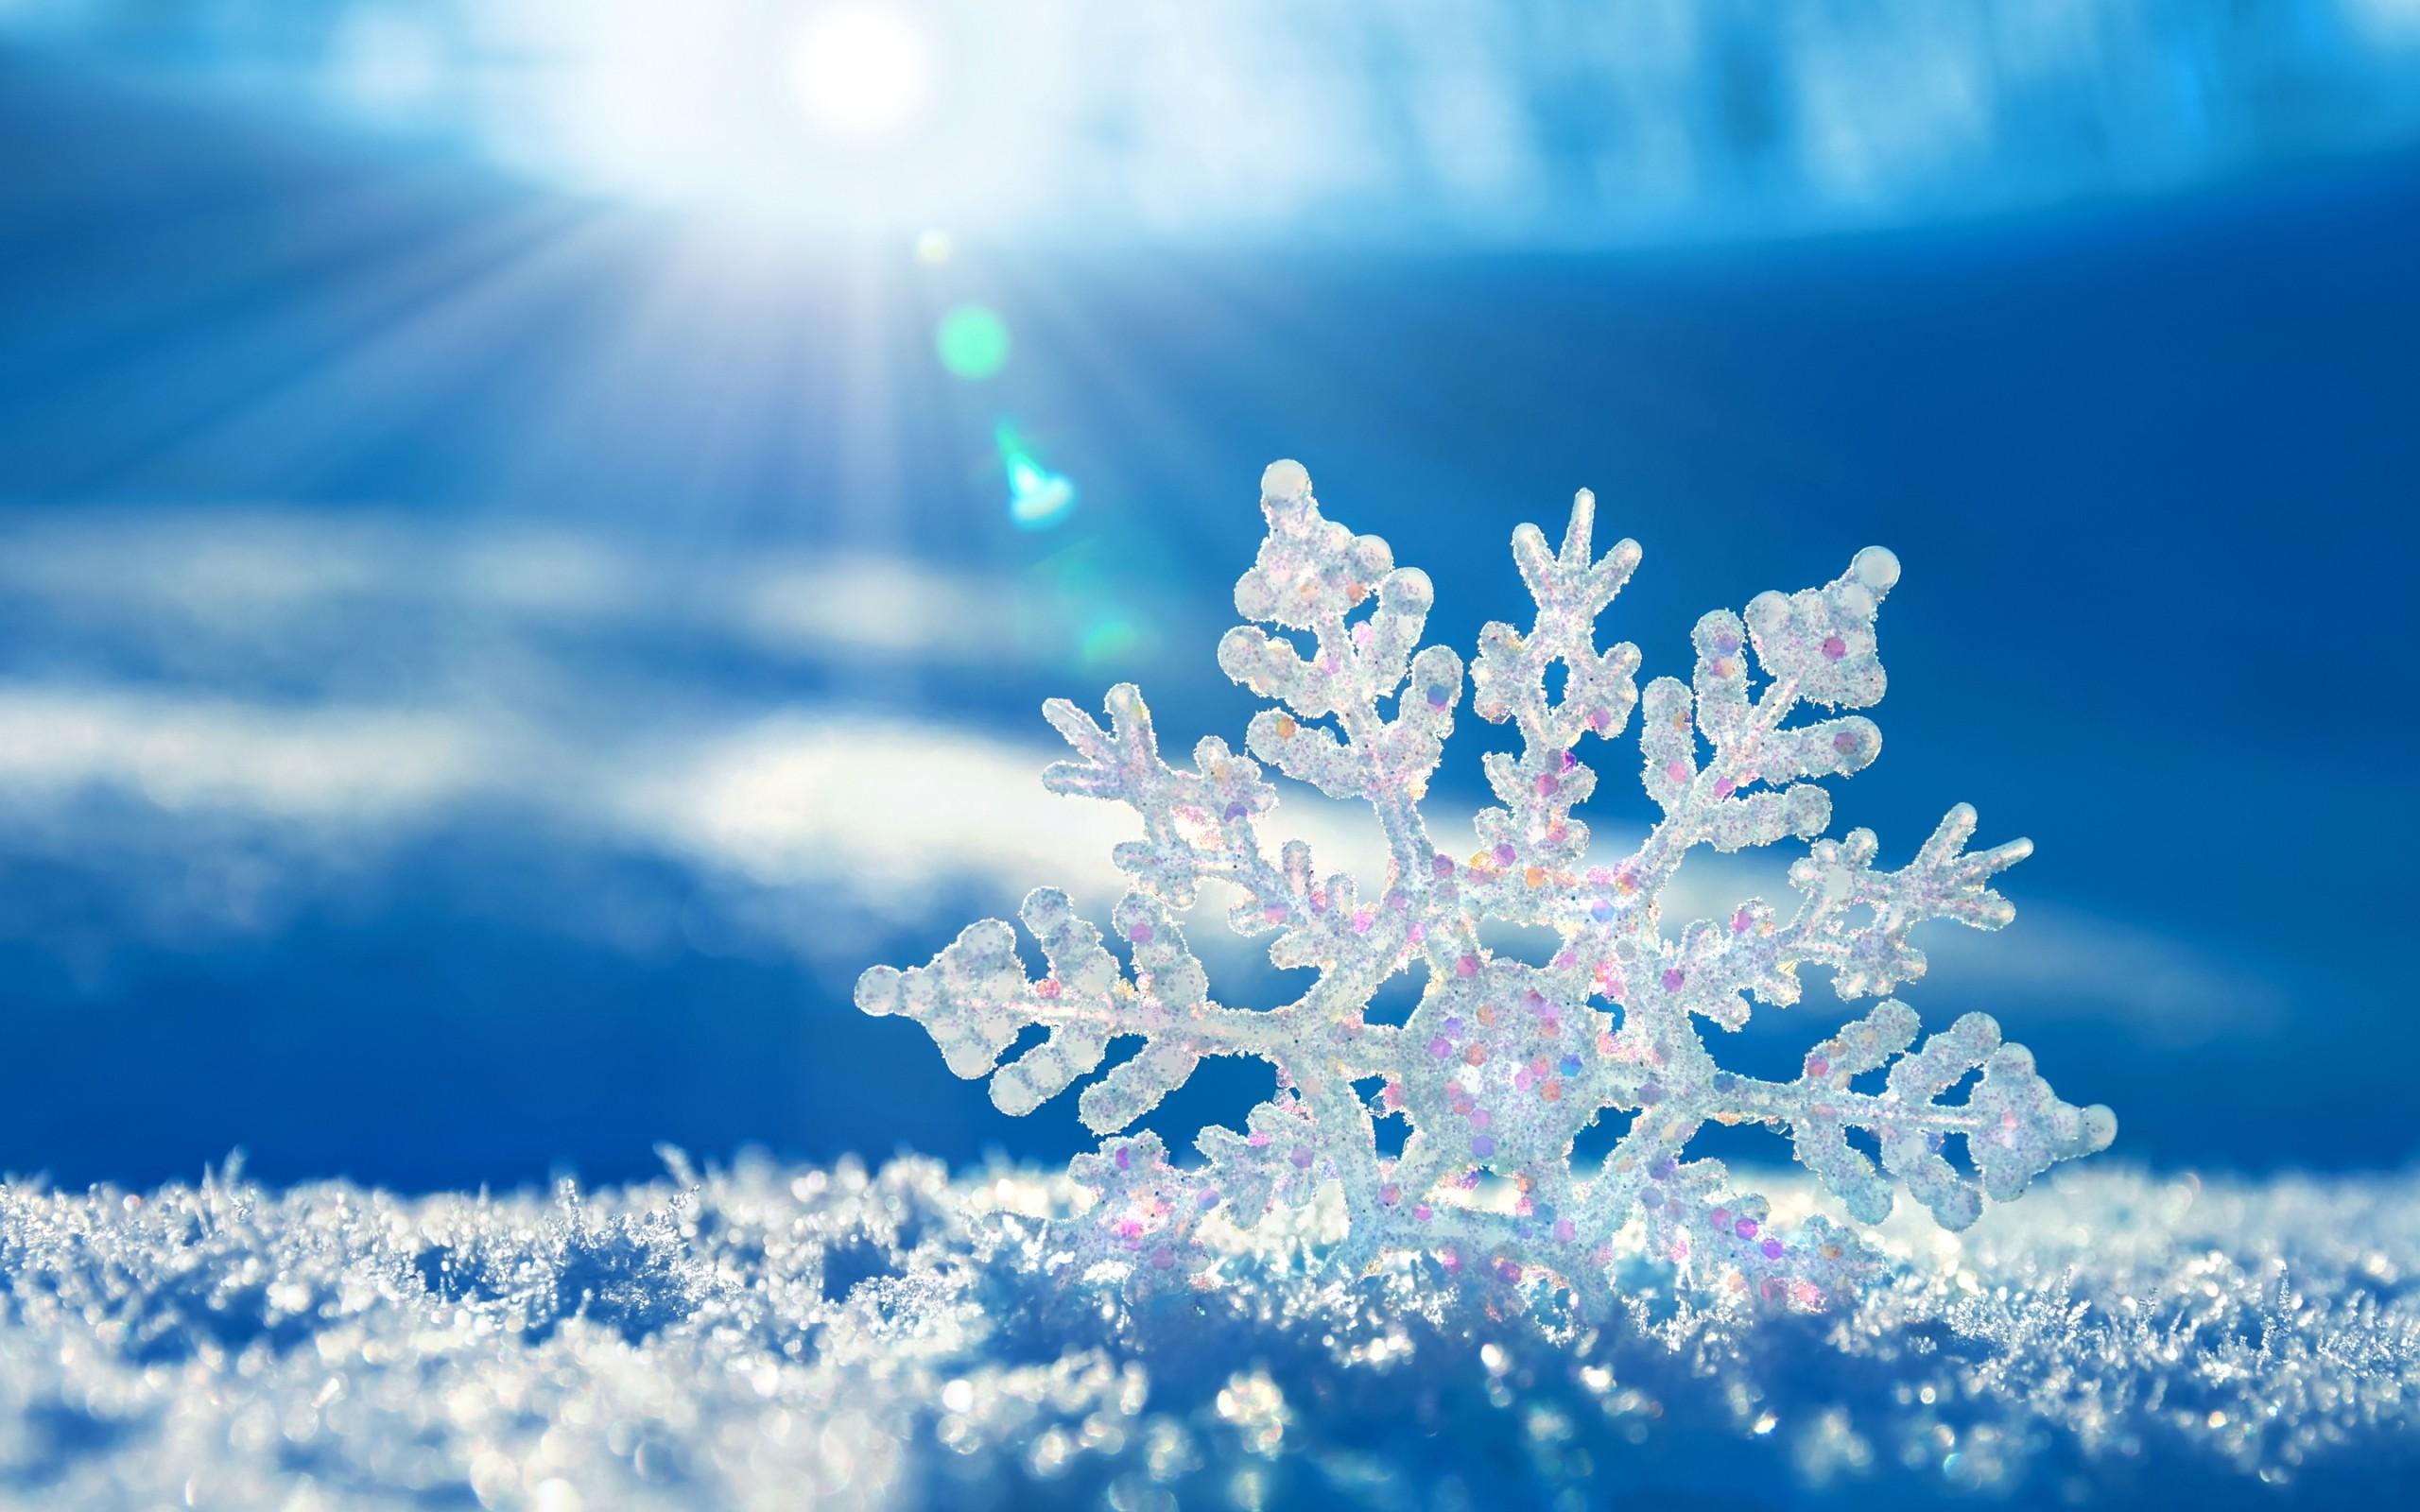 Cristal de hielo - 2560x1600